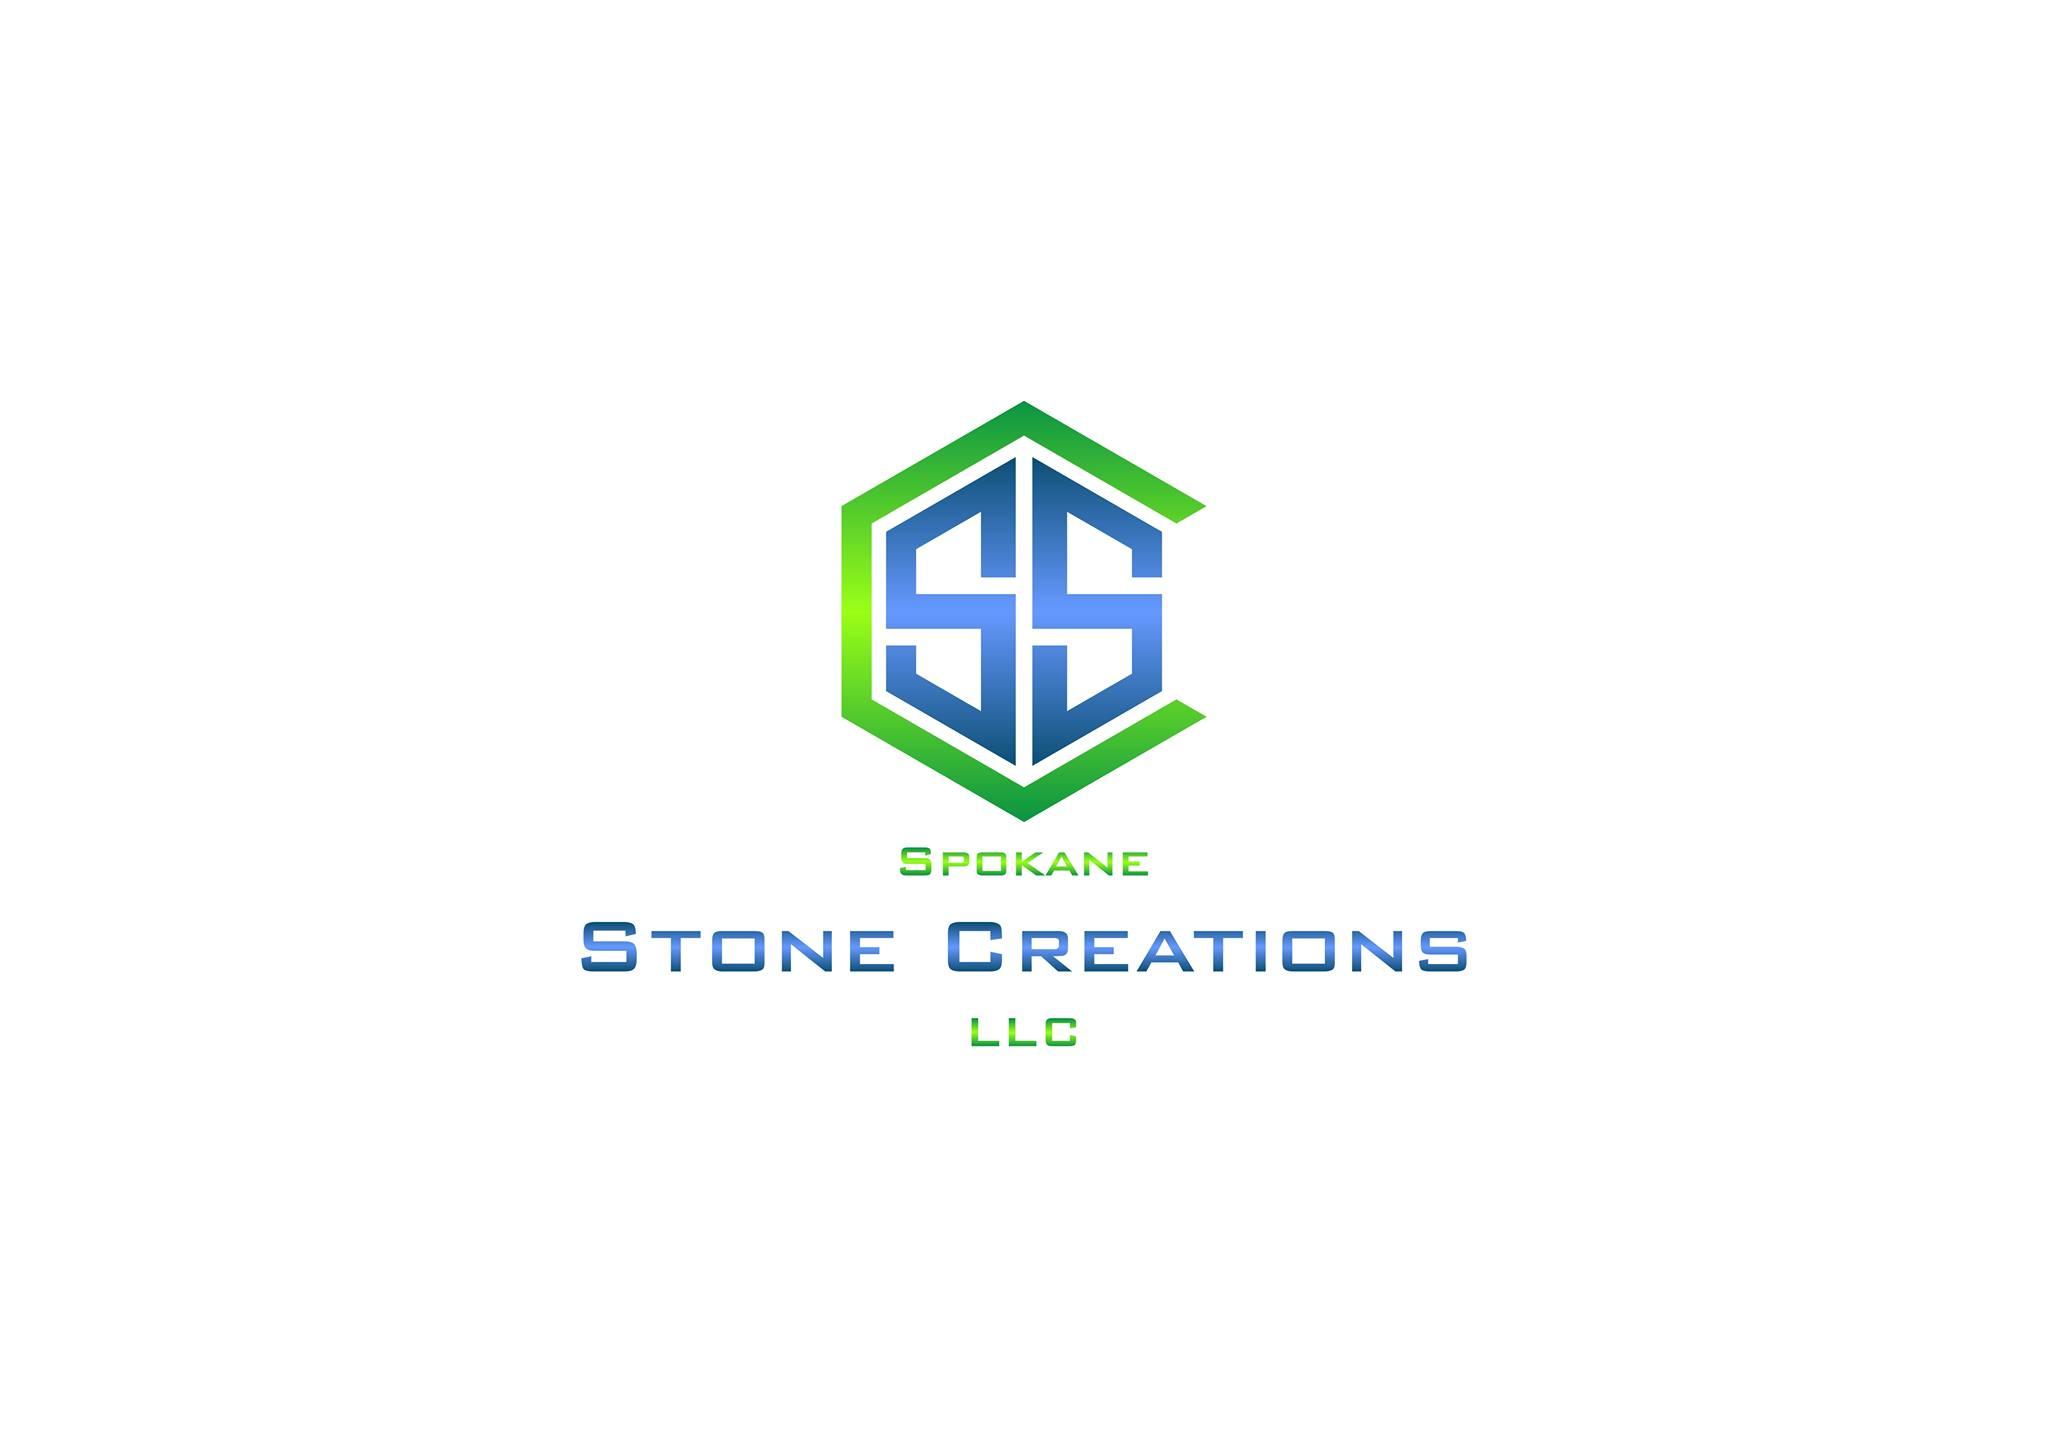 Spokane Stone Creations, LLC. logo